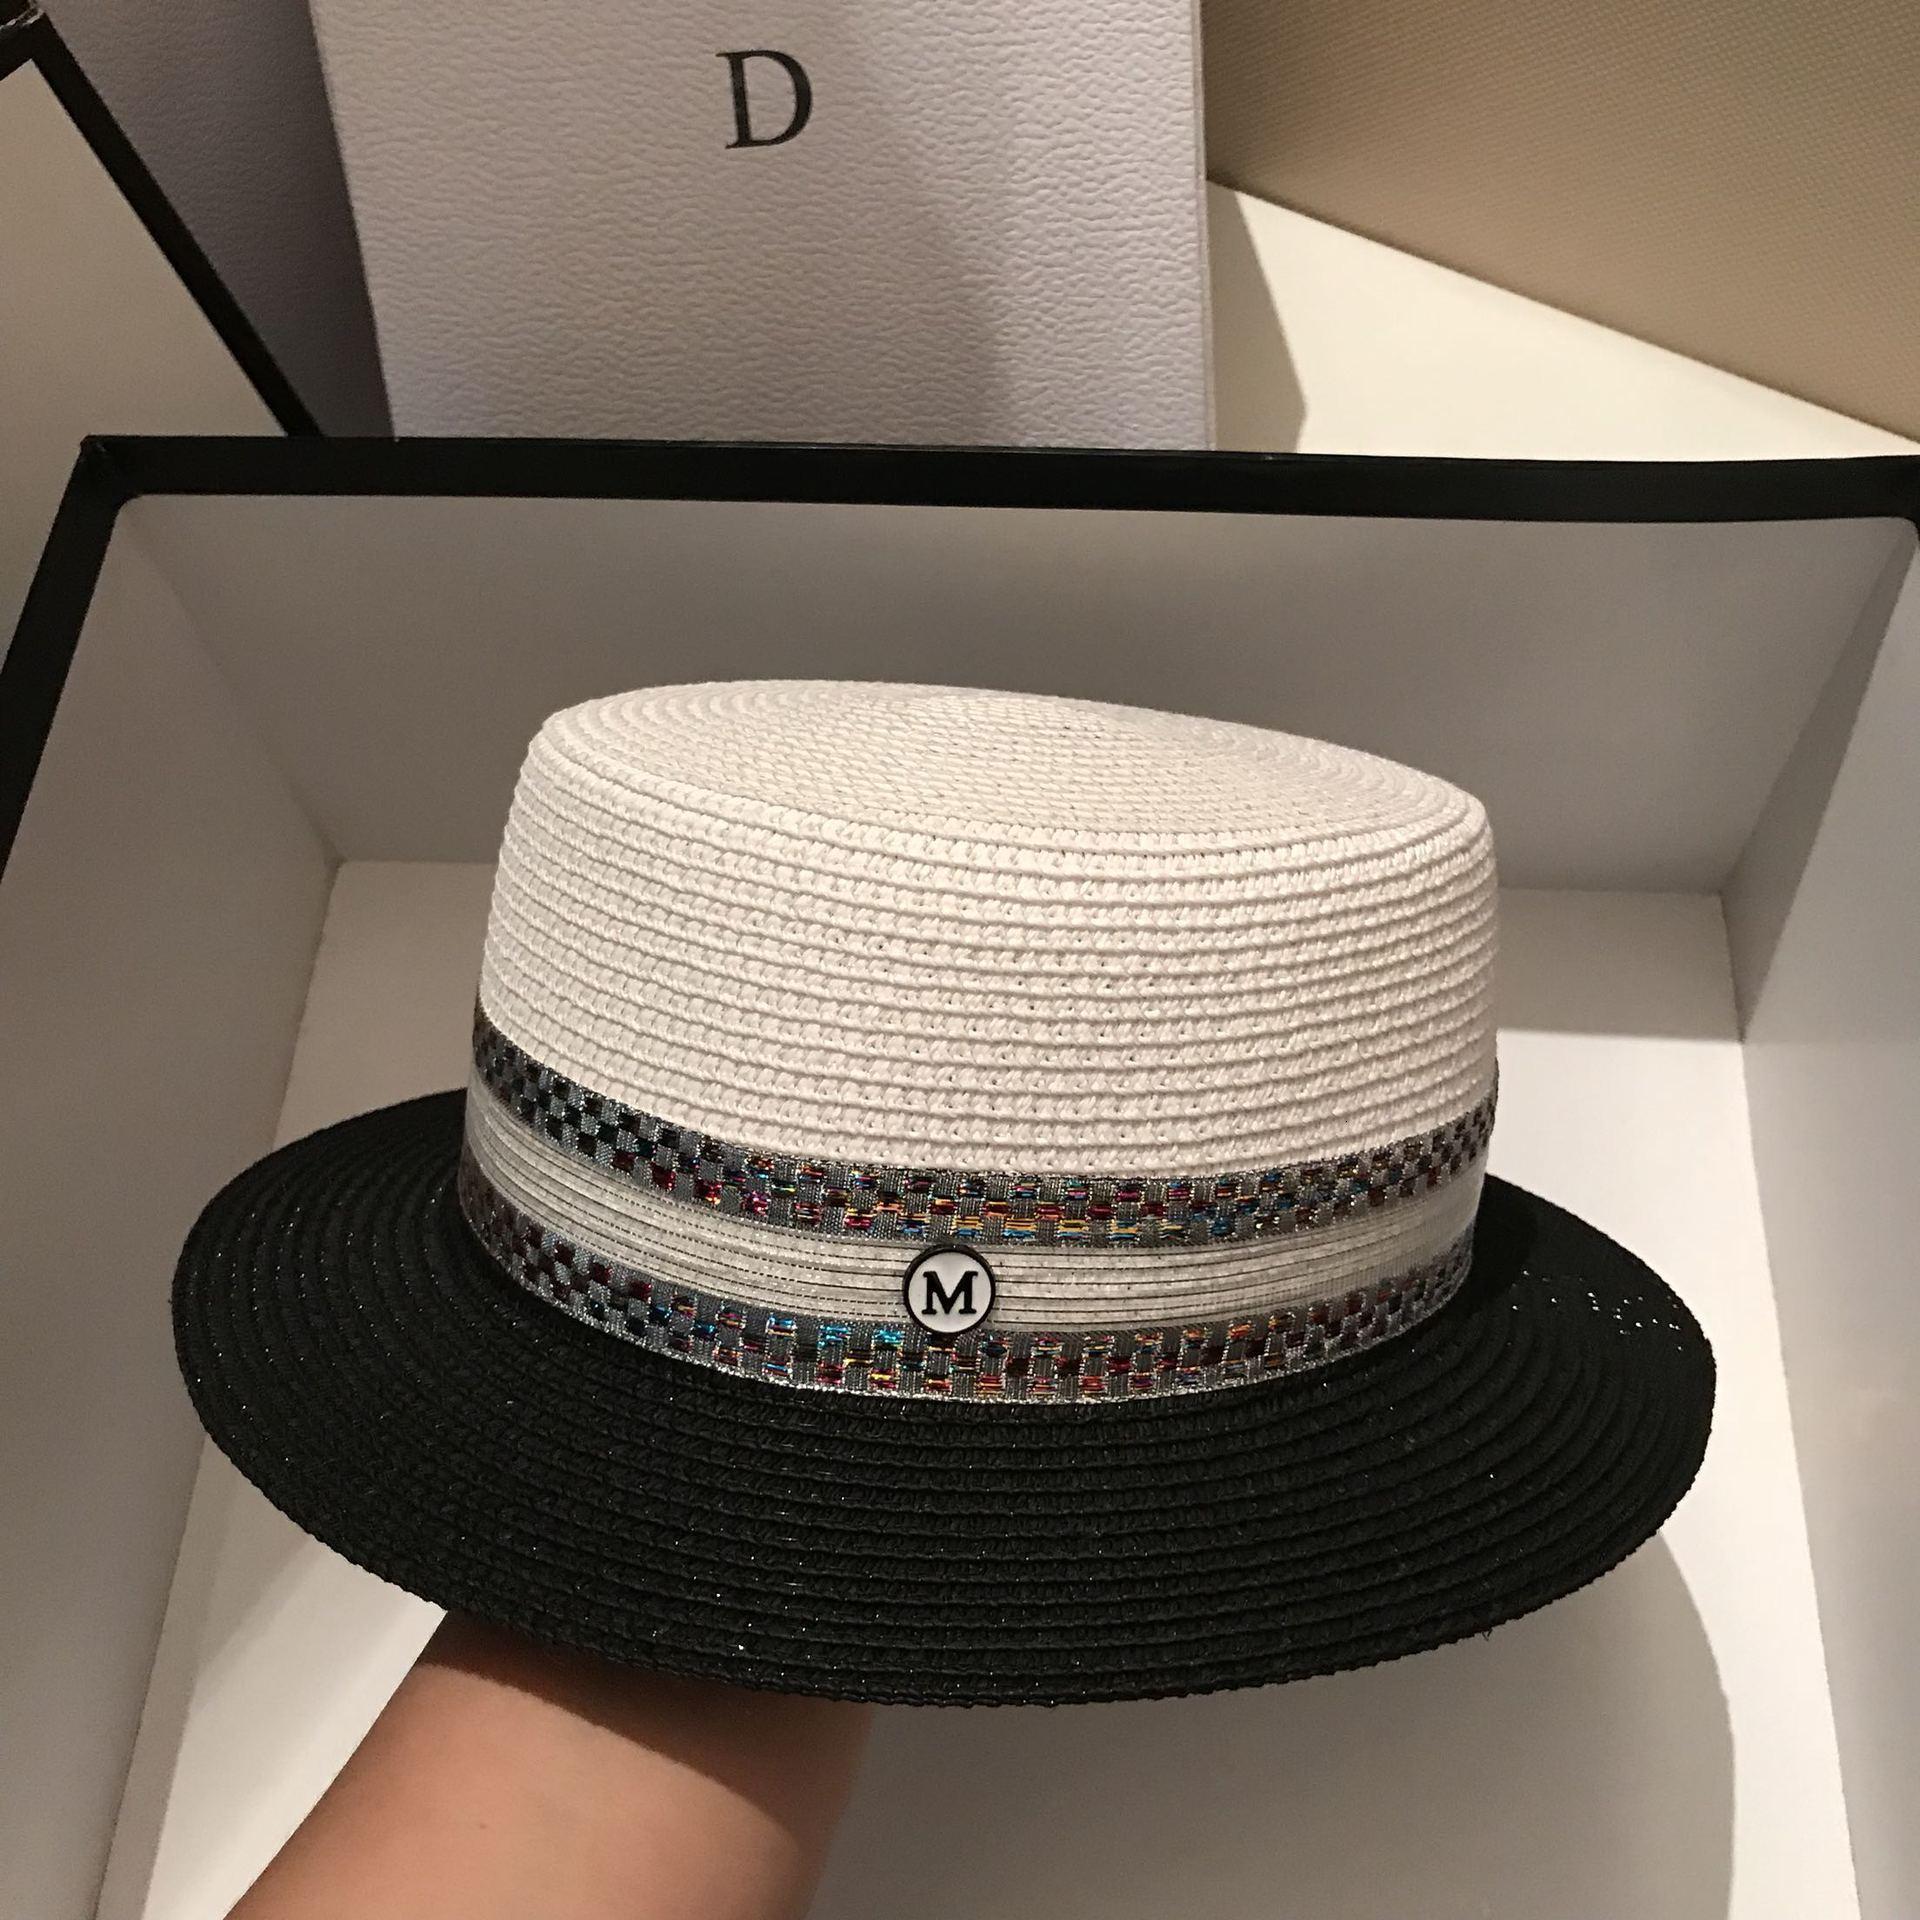 2020 Summer Flat Sun Hats For Women Chapeau Feminino Straw Hat Panama Cappelli Side With Splicing Beach Bucket Cap Girl Topee